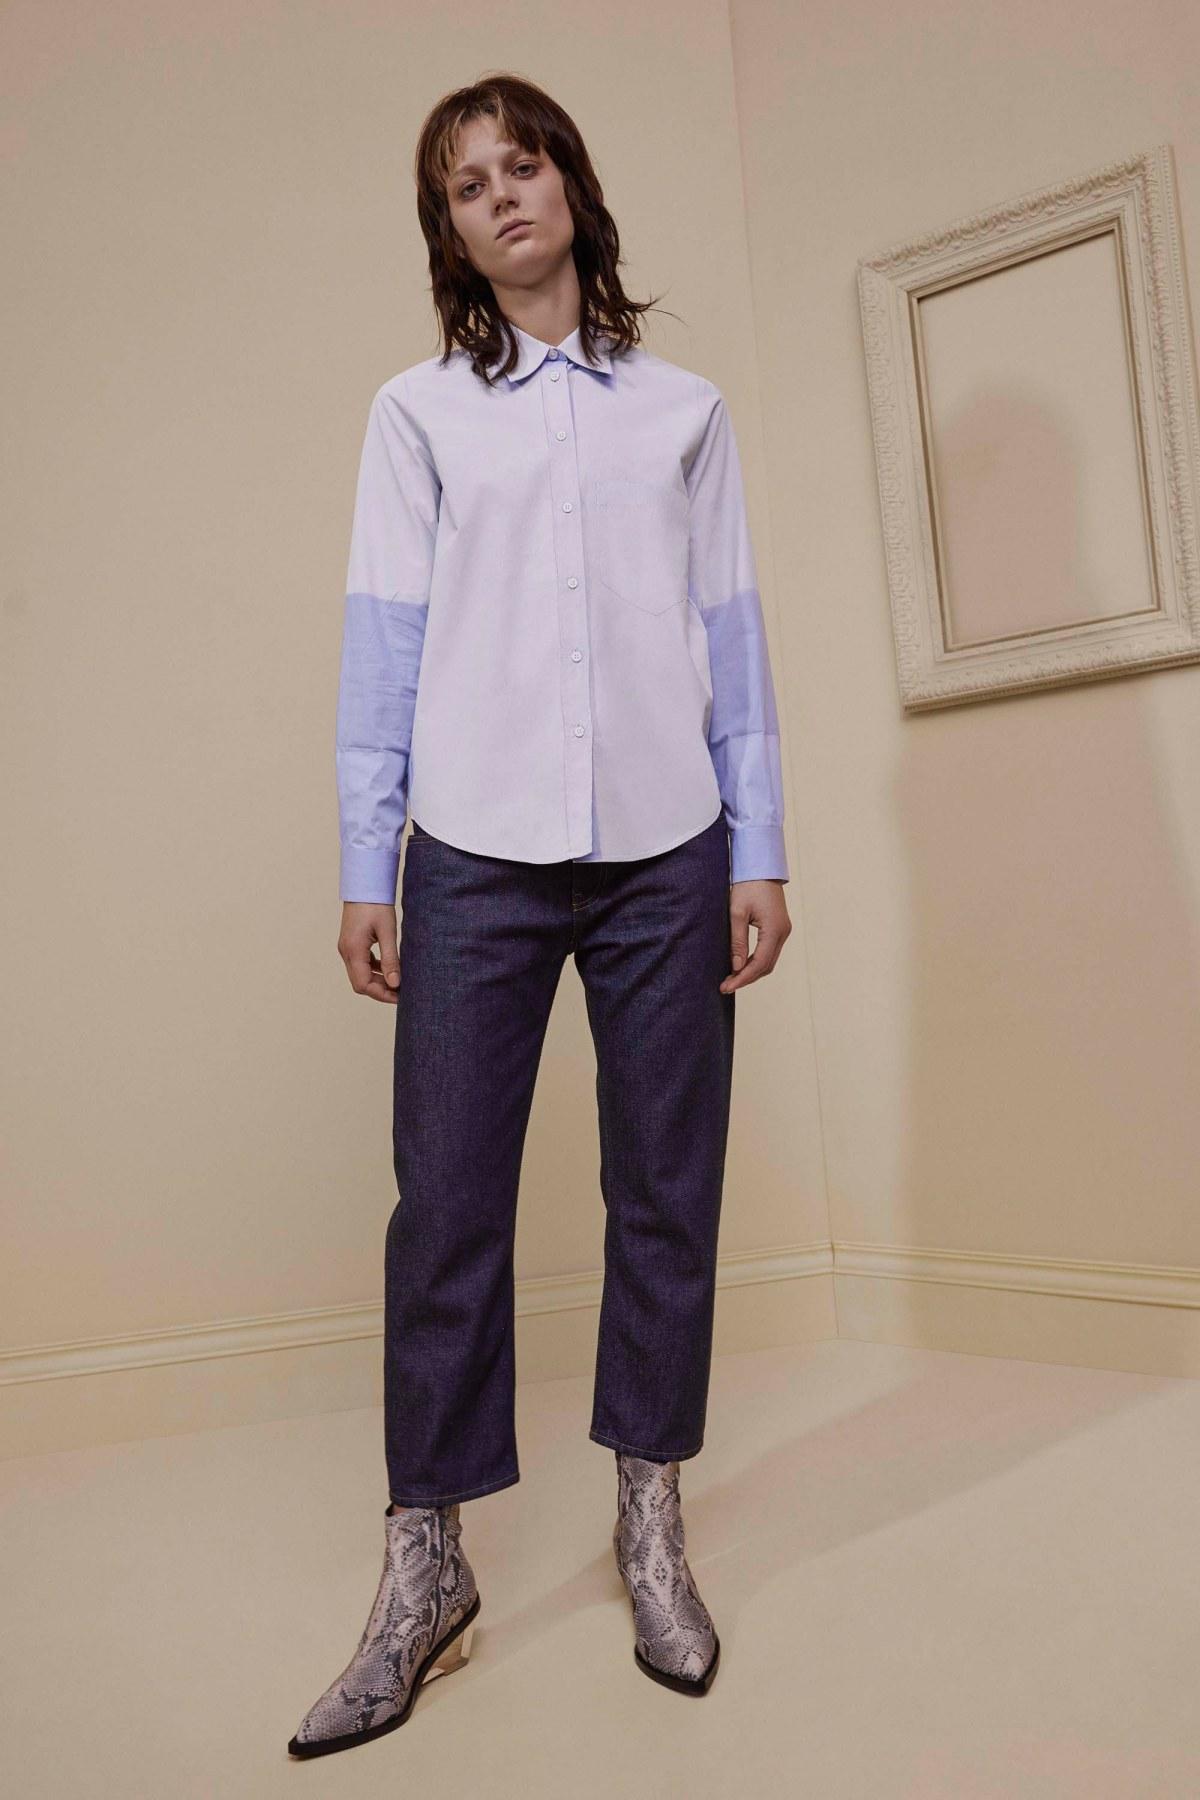 mm6-maison-margiela-pre-fall-2017-fashion-show-the-impression-20